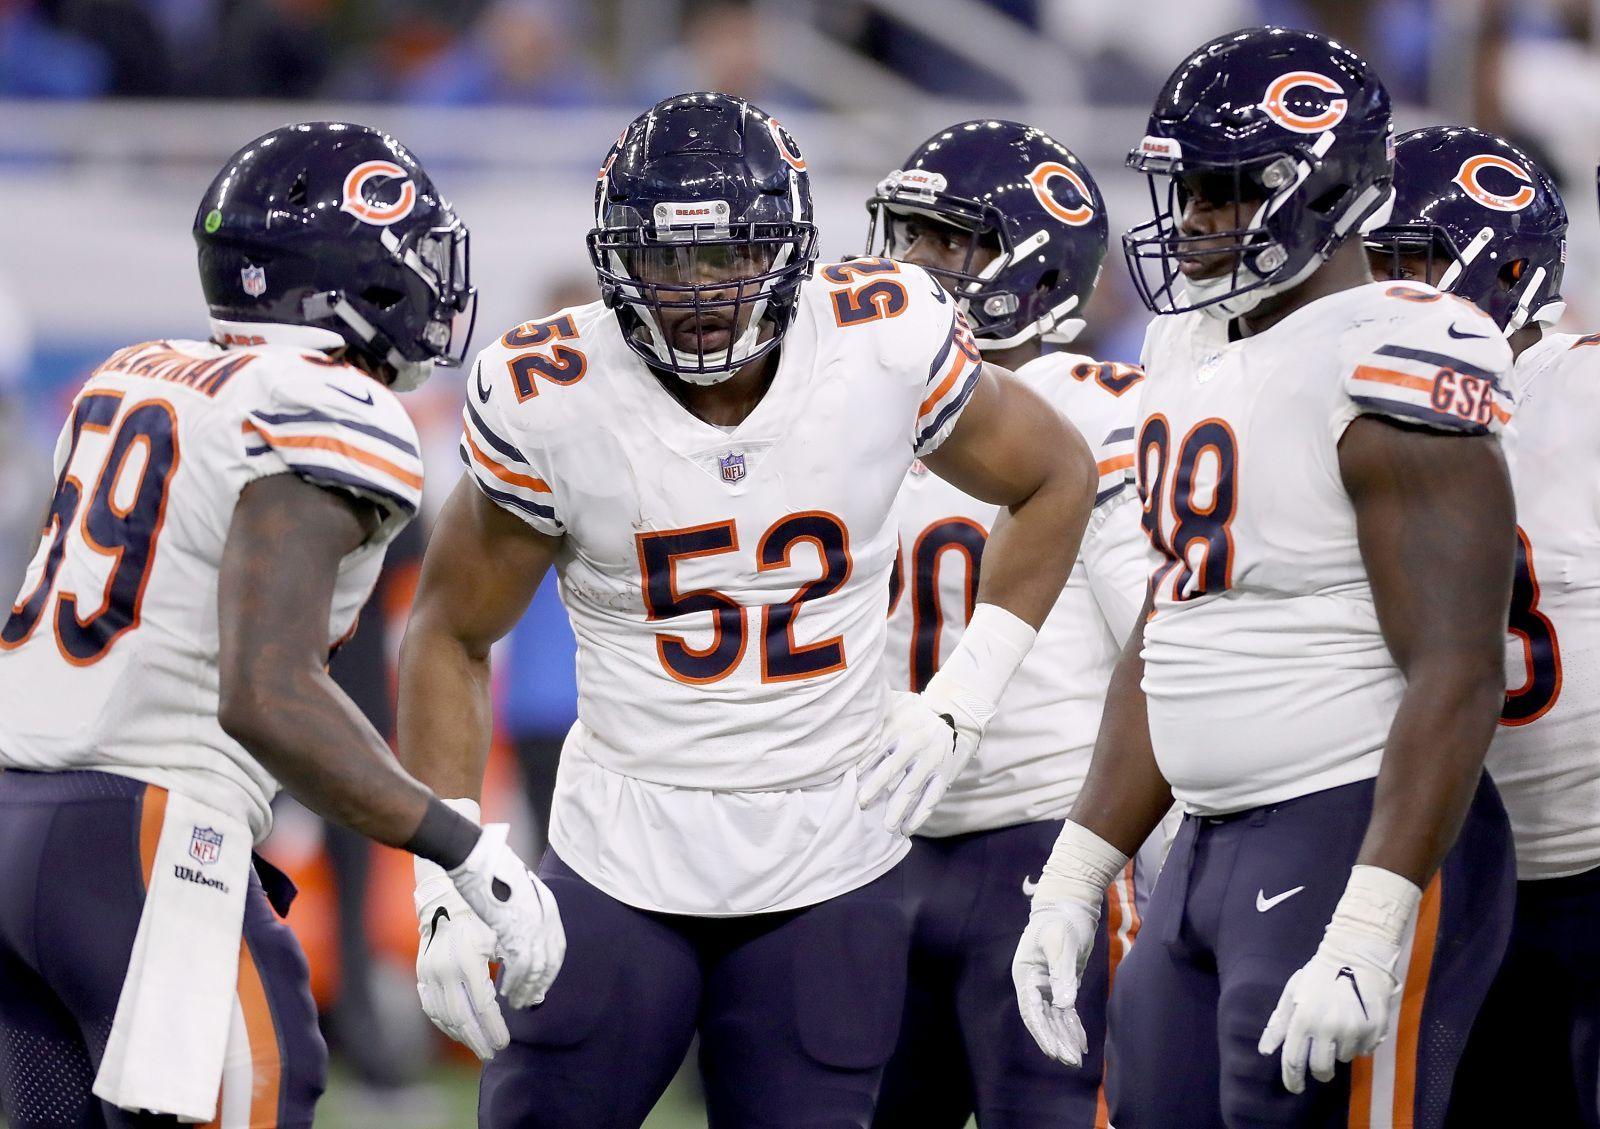 All Eyes On Khalil Mack As New York Giants Host Bears New York Giants Mack Chicago Bears Super Bowl